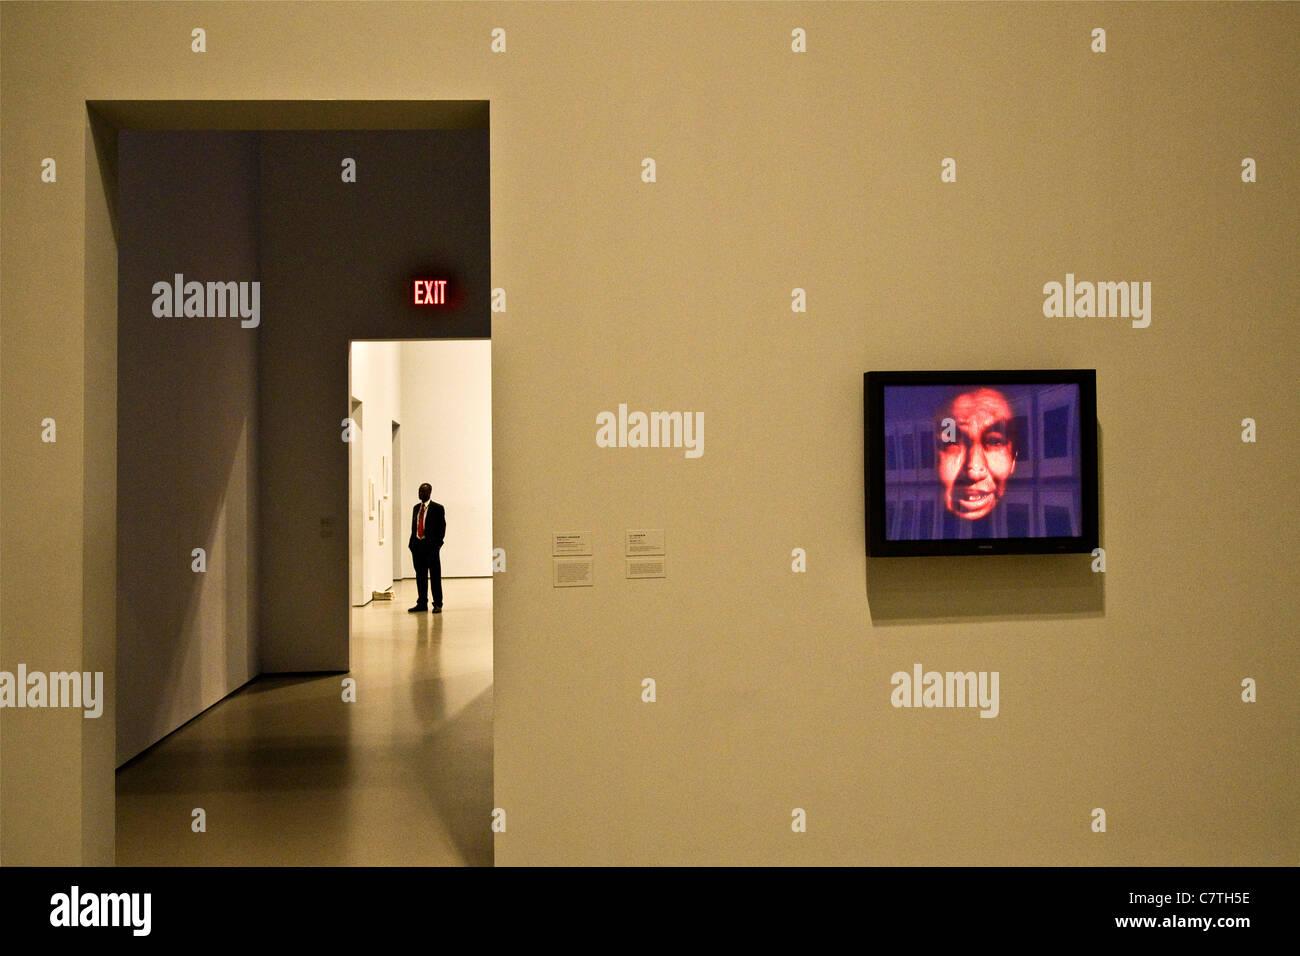 USA, New York, New York City, Manhattan, Museum of modern art, MOMA - Stock Image